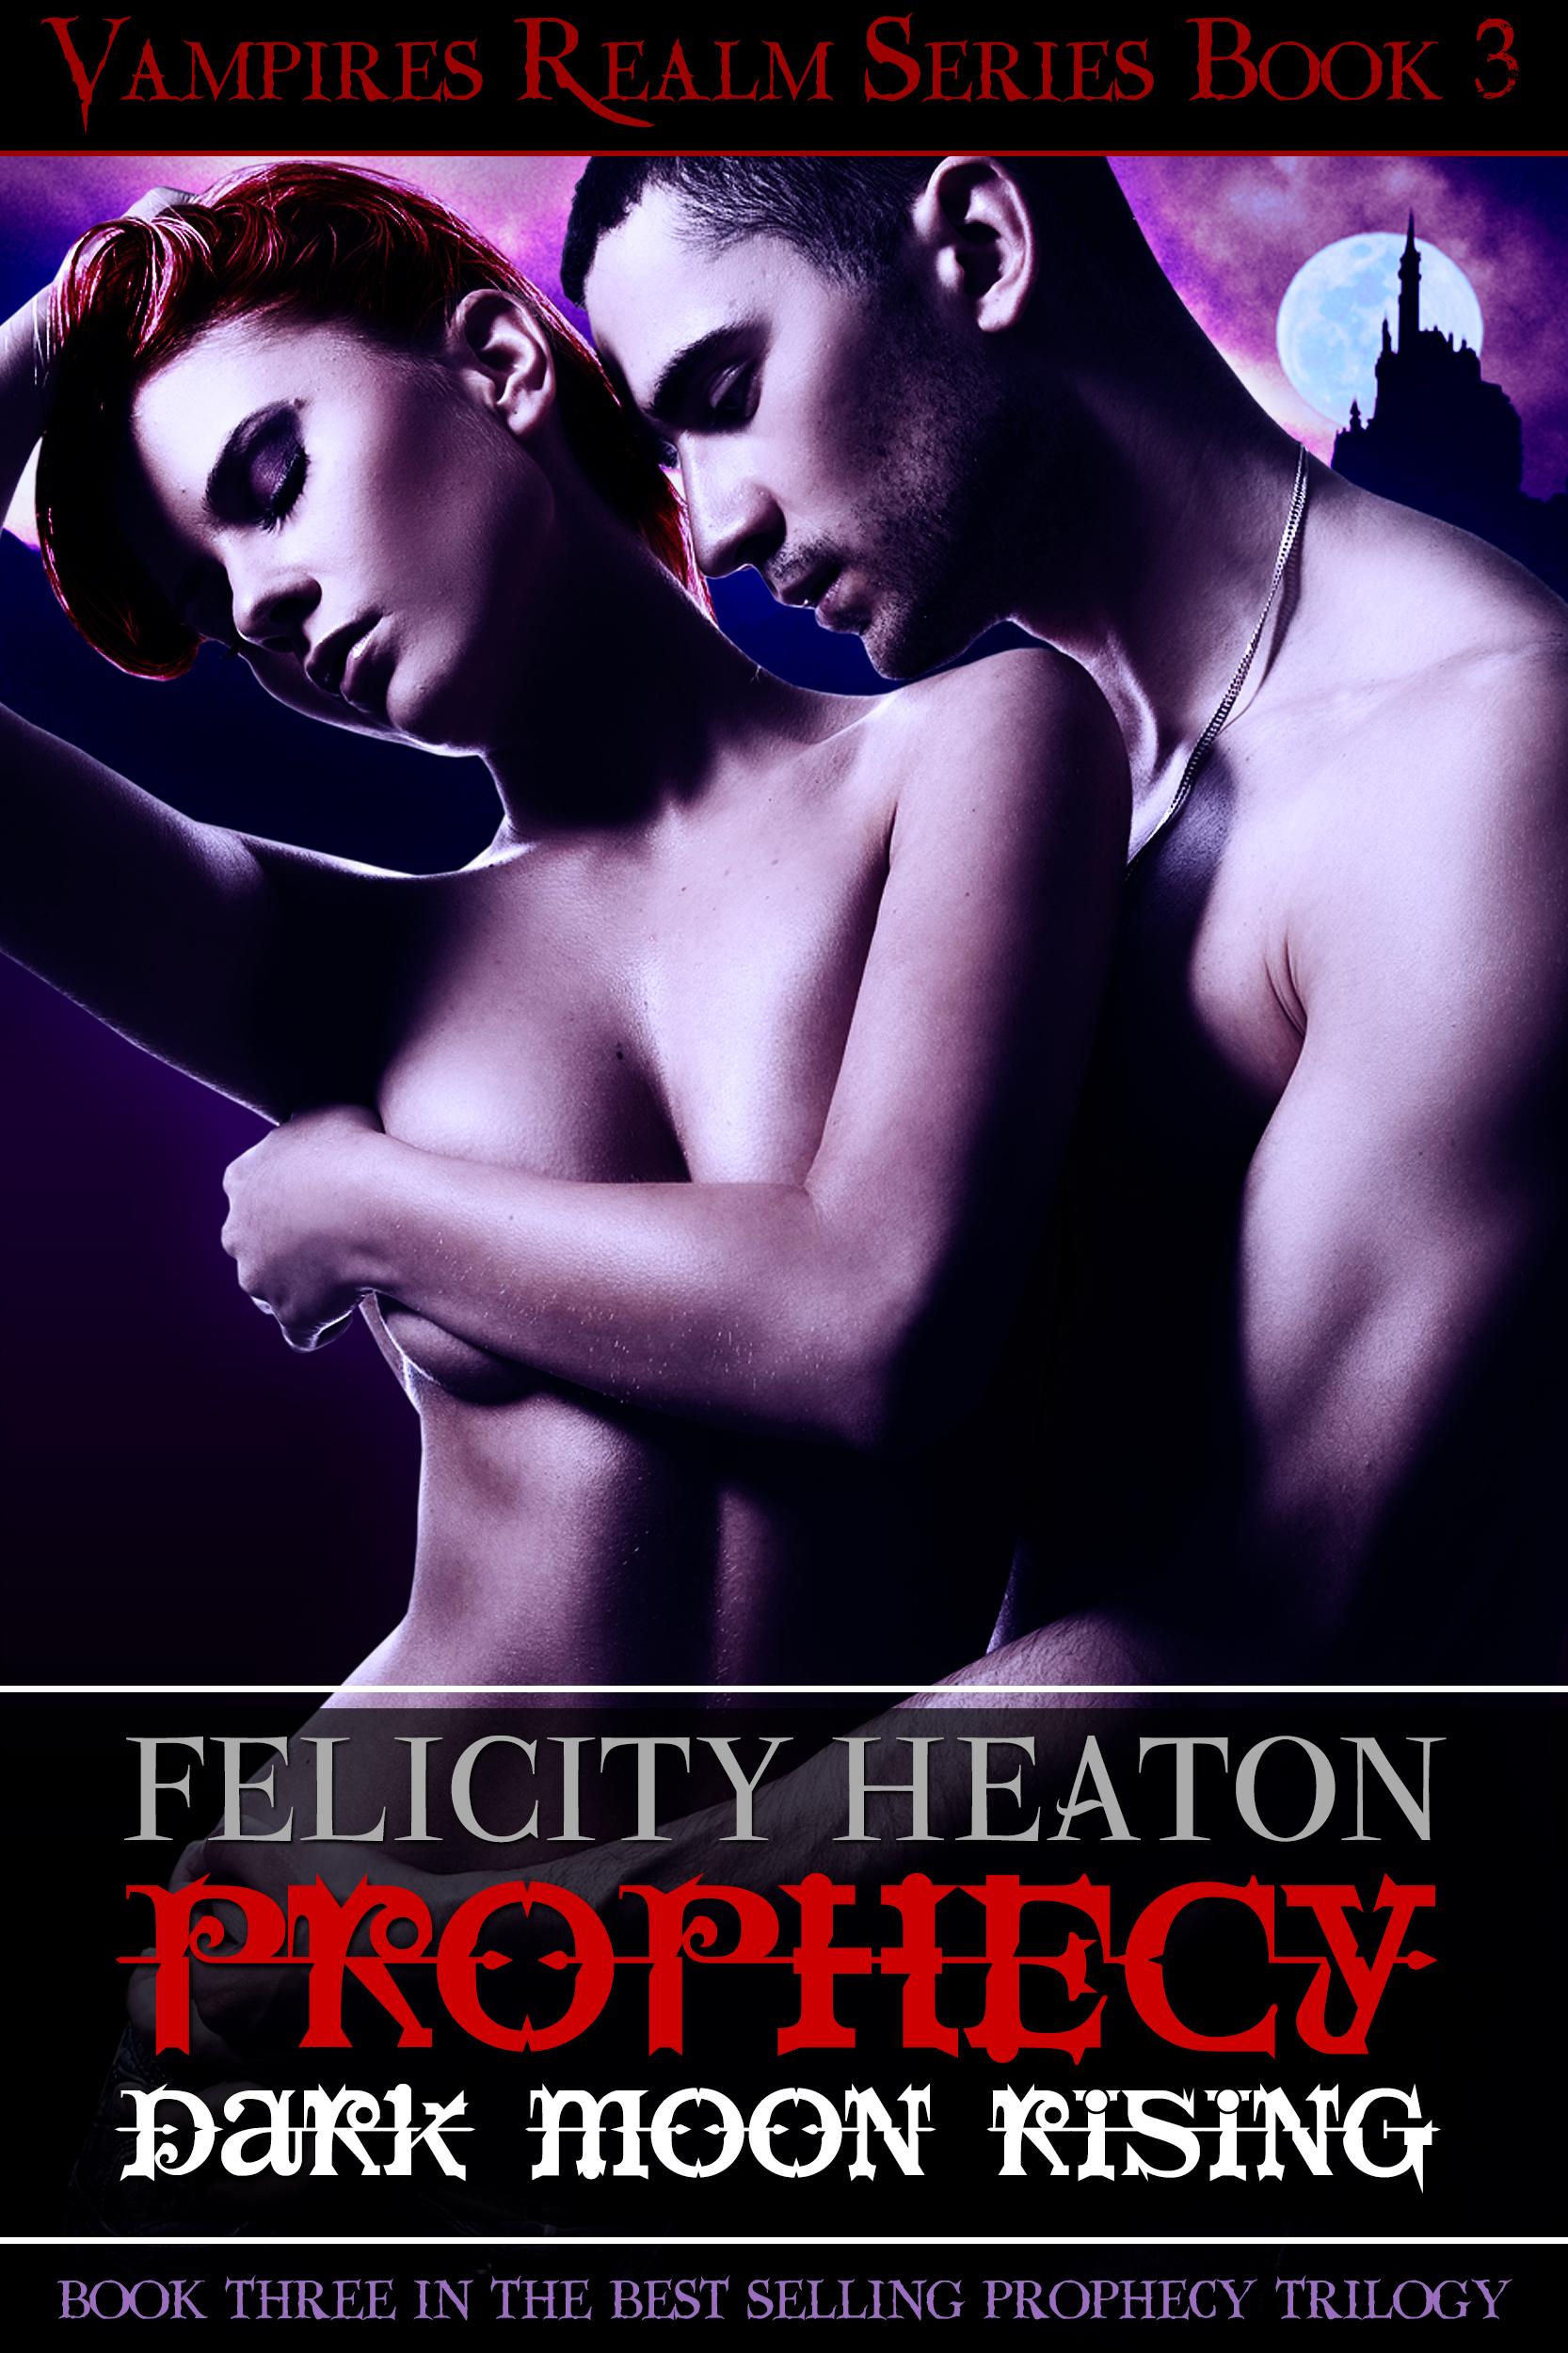 Felicity Heaton - Prophecy: Dark Moon Rising (Vampires Realm Romance Series #3)